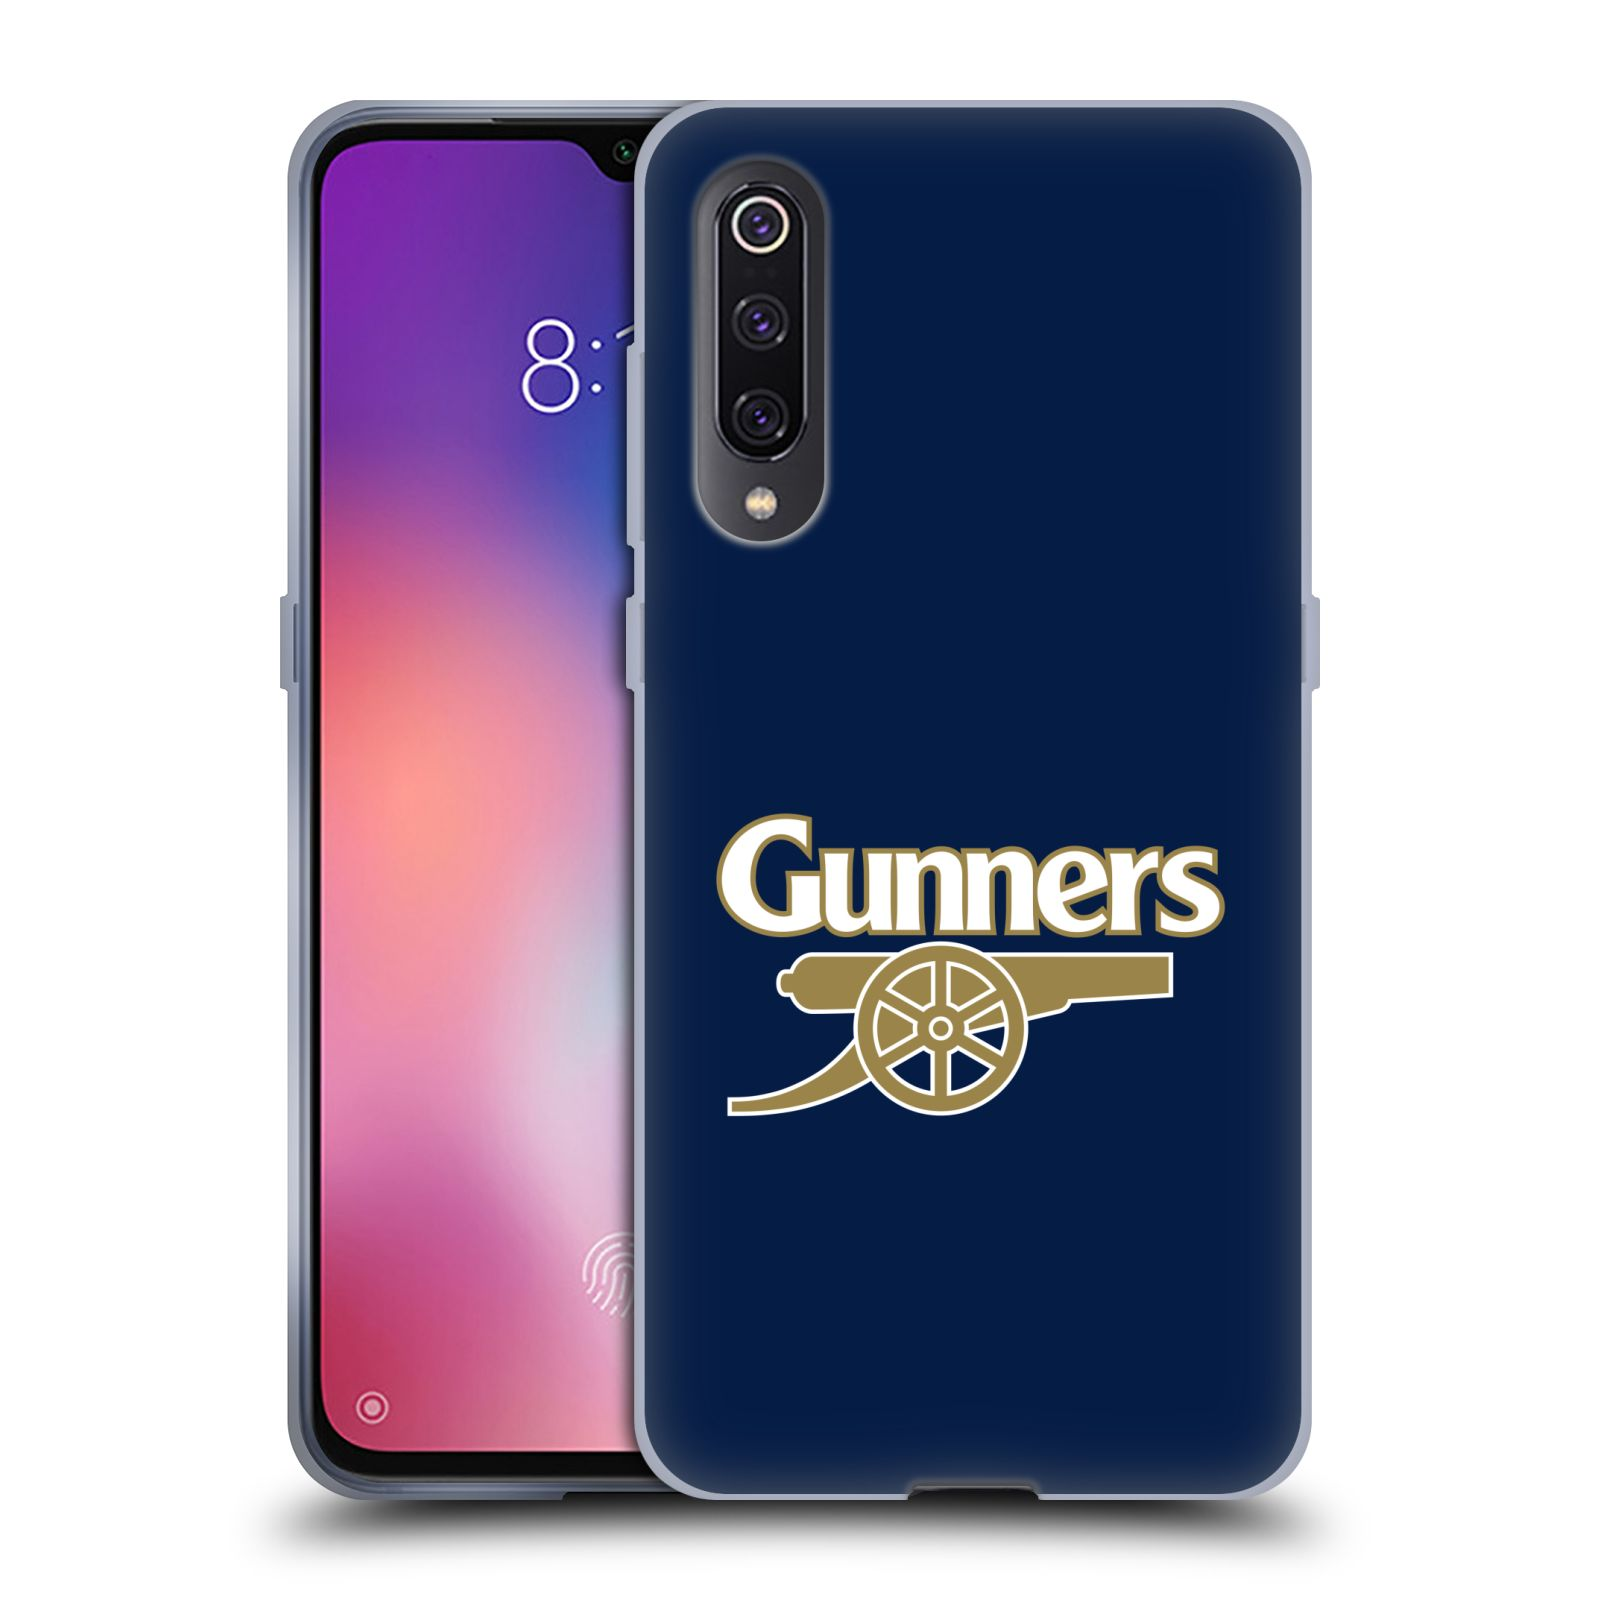 Silikonové pouzdro na mobil Xiaomi Mi 9 - Head Case - Arsenal FC - Gunners